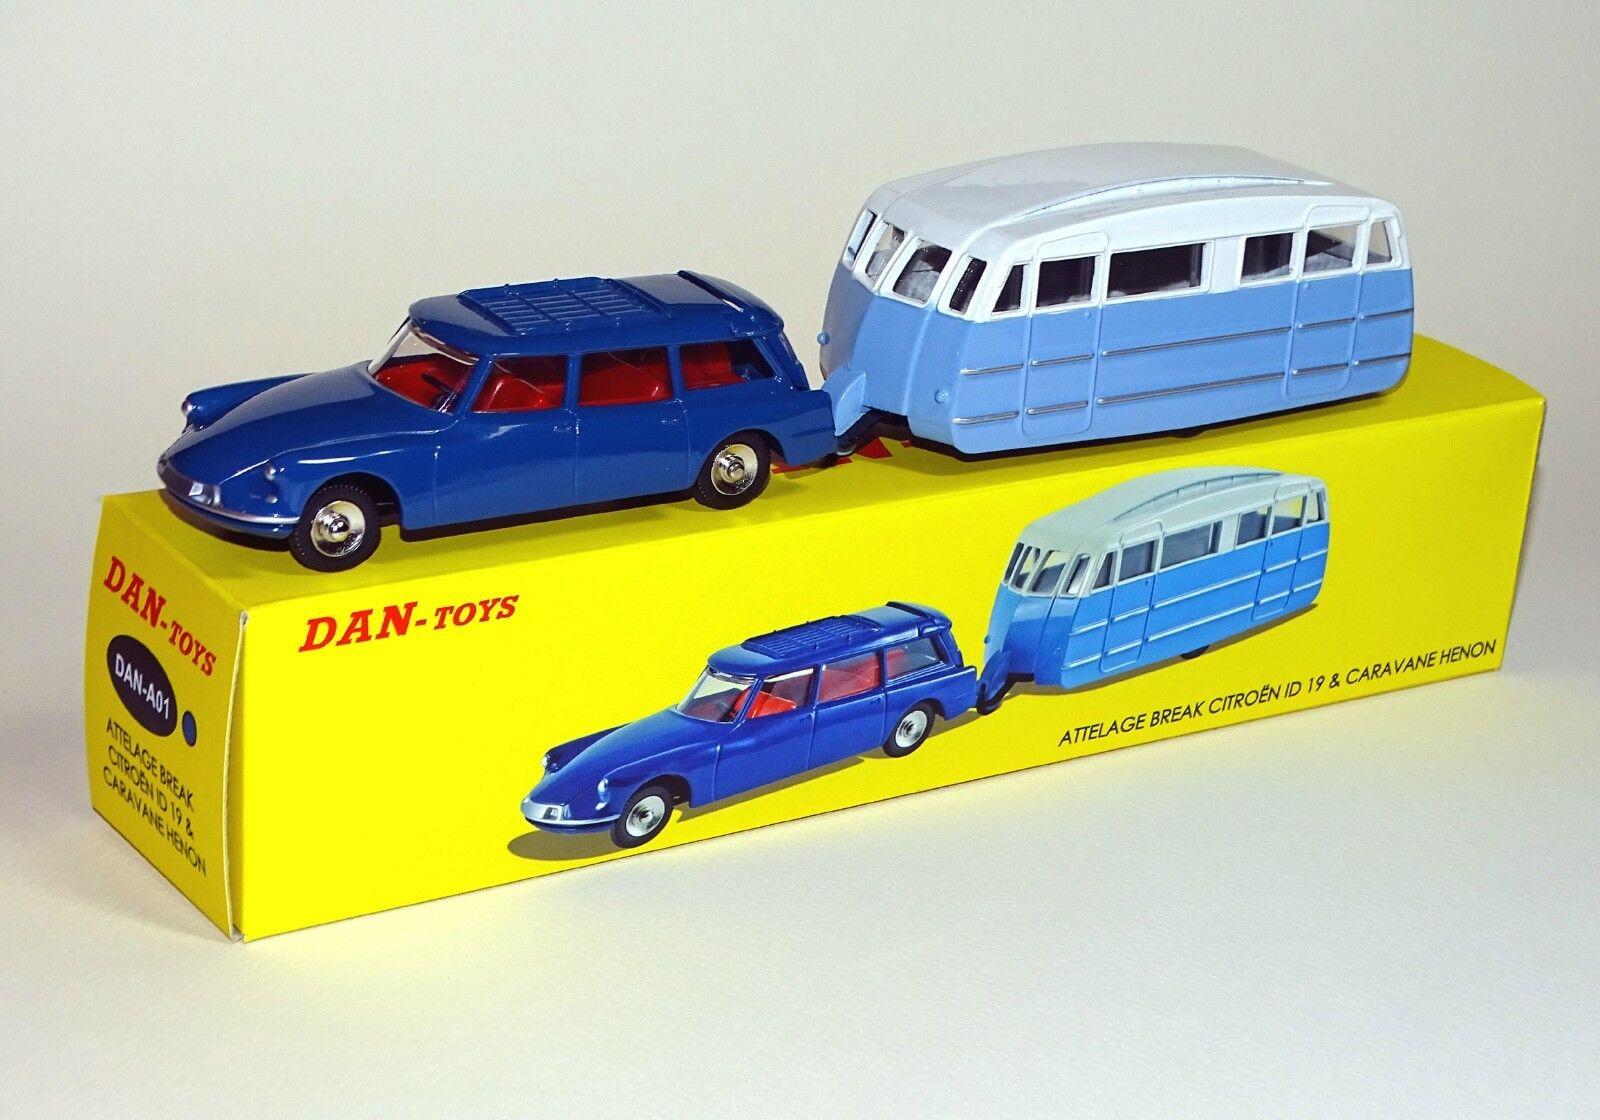 DAN TOYS Citroën ID 19 Blu Scuro e Caravan Hénon blu / Bianco DAN-A01